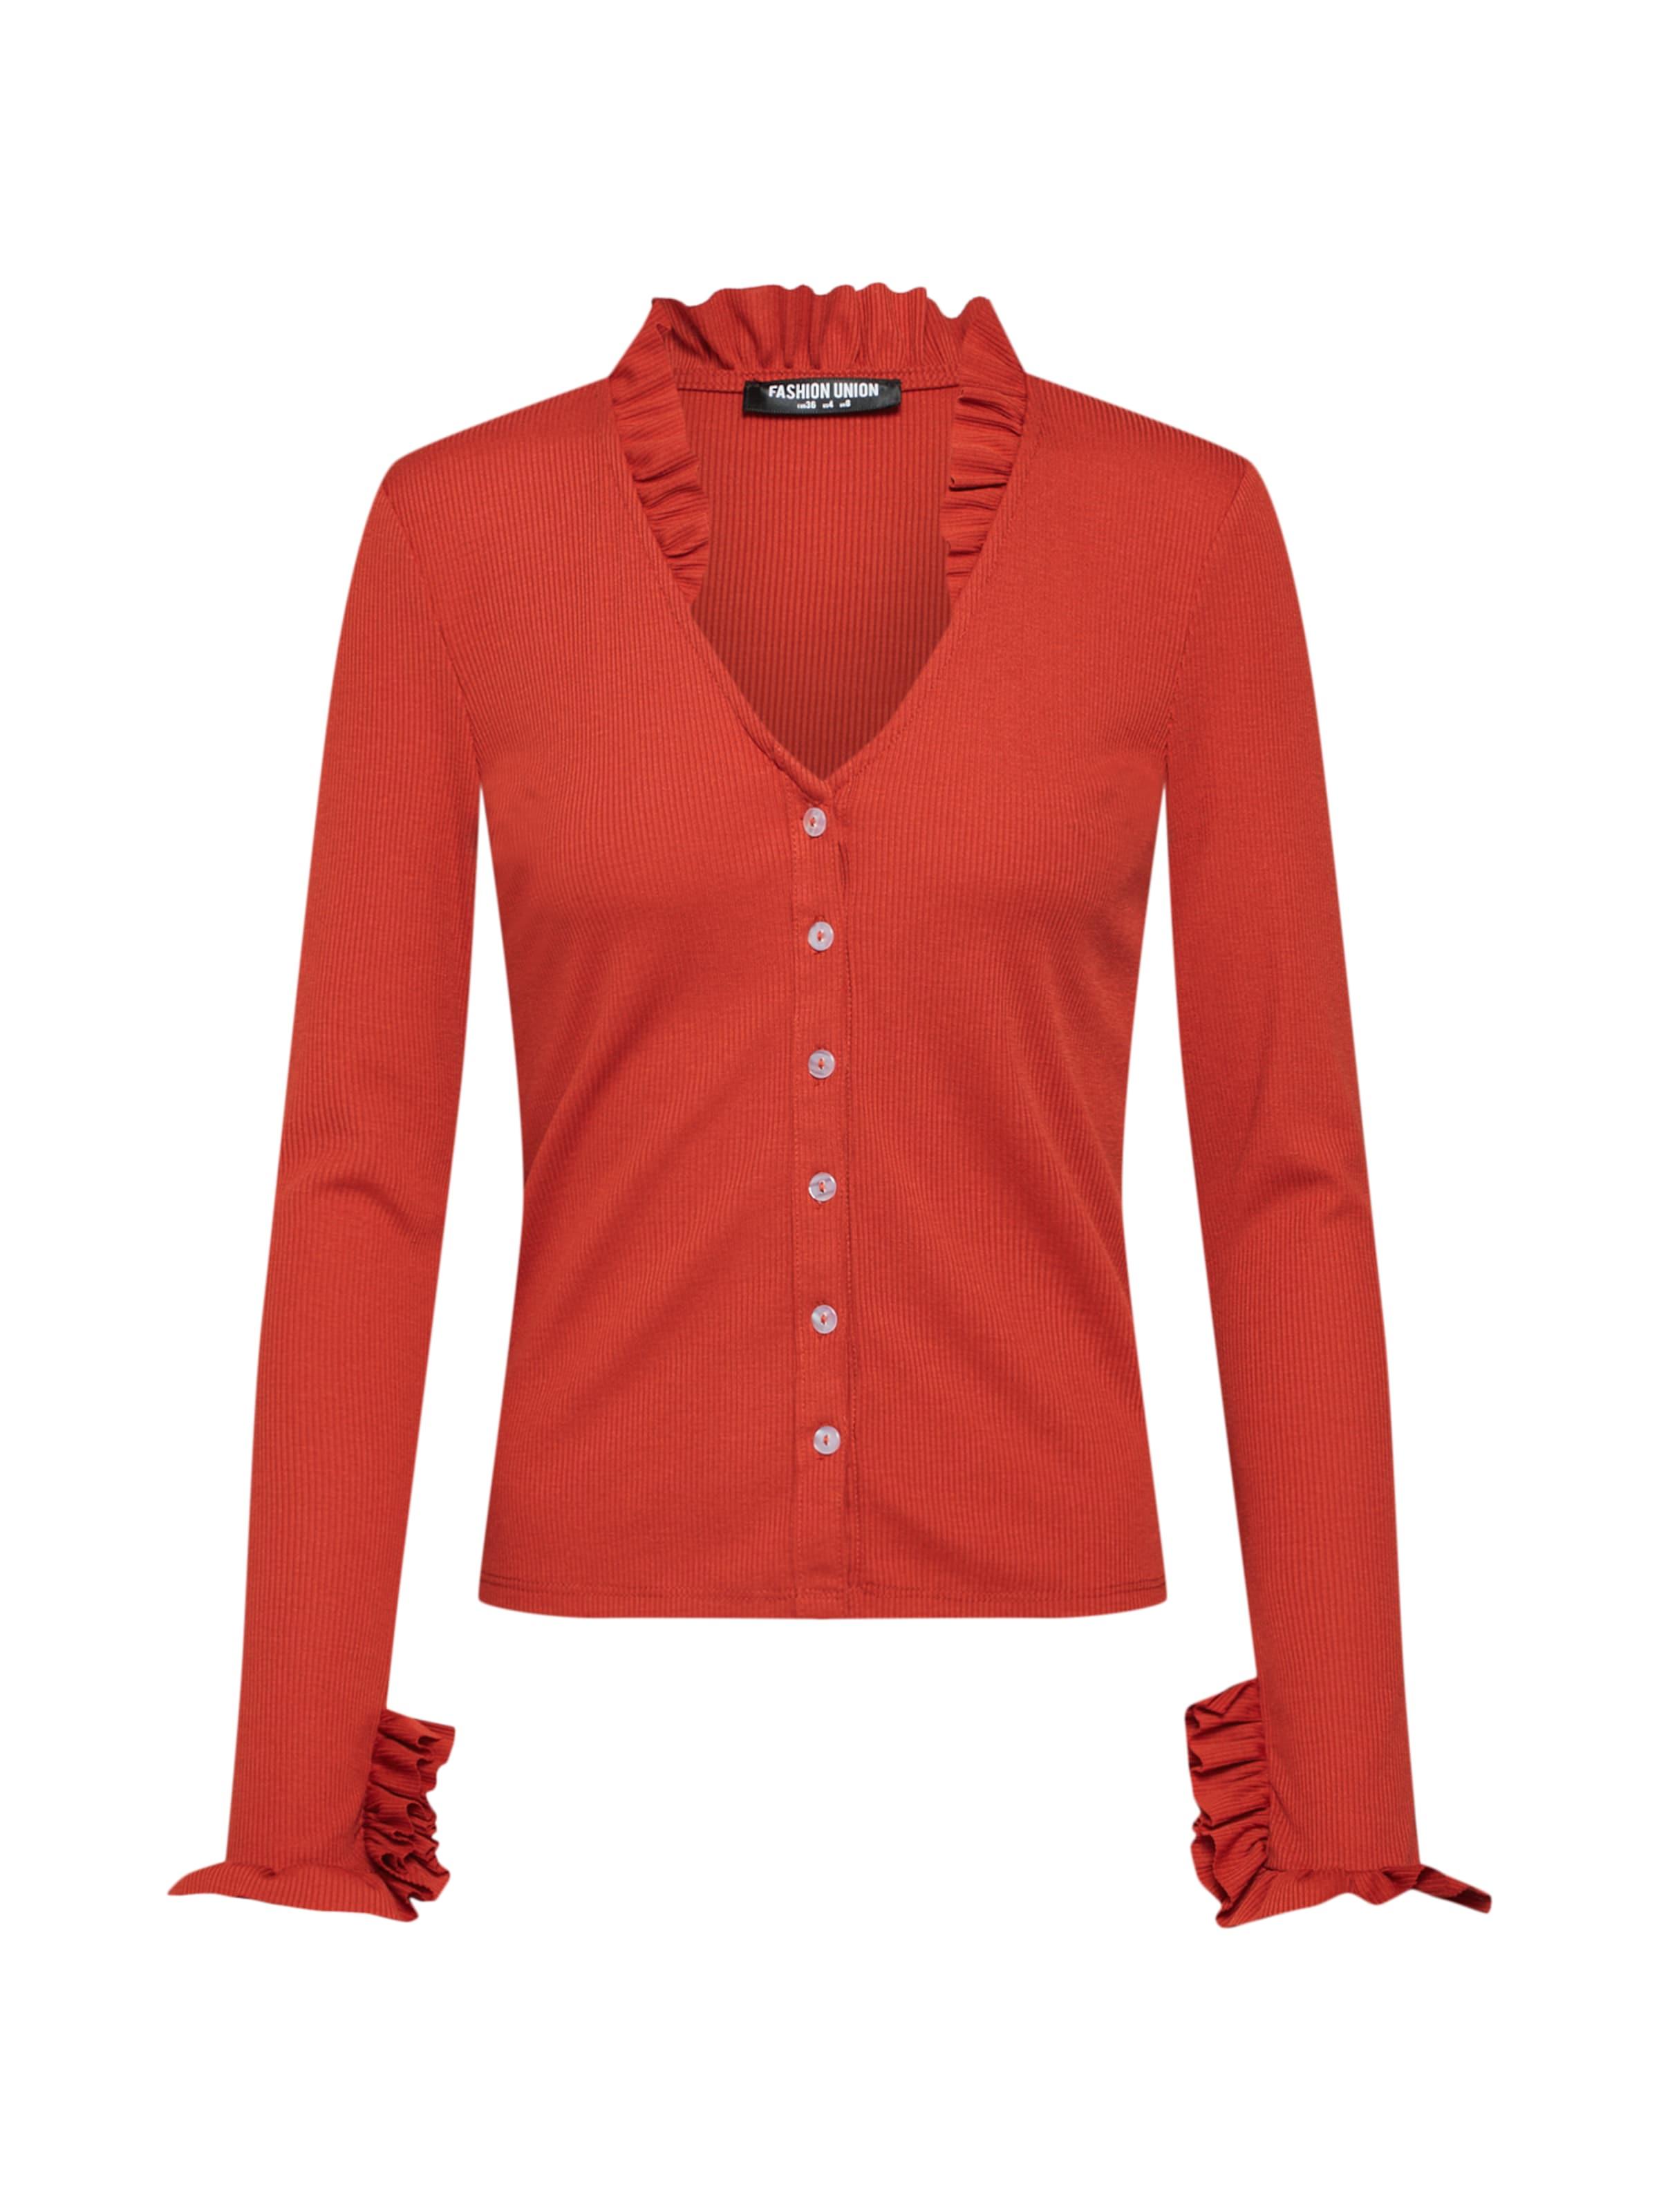 Orangerot 'wren' In Fashion Shirt Union wOk0nP